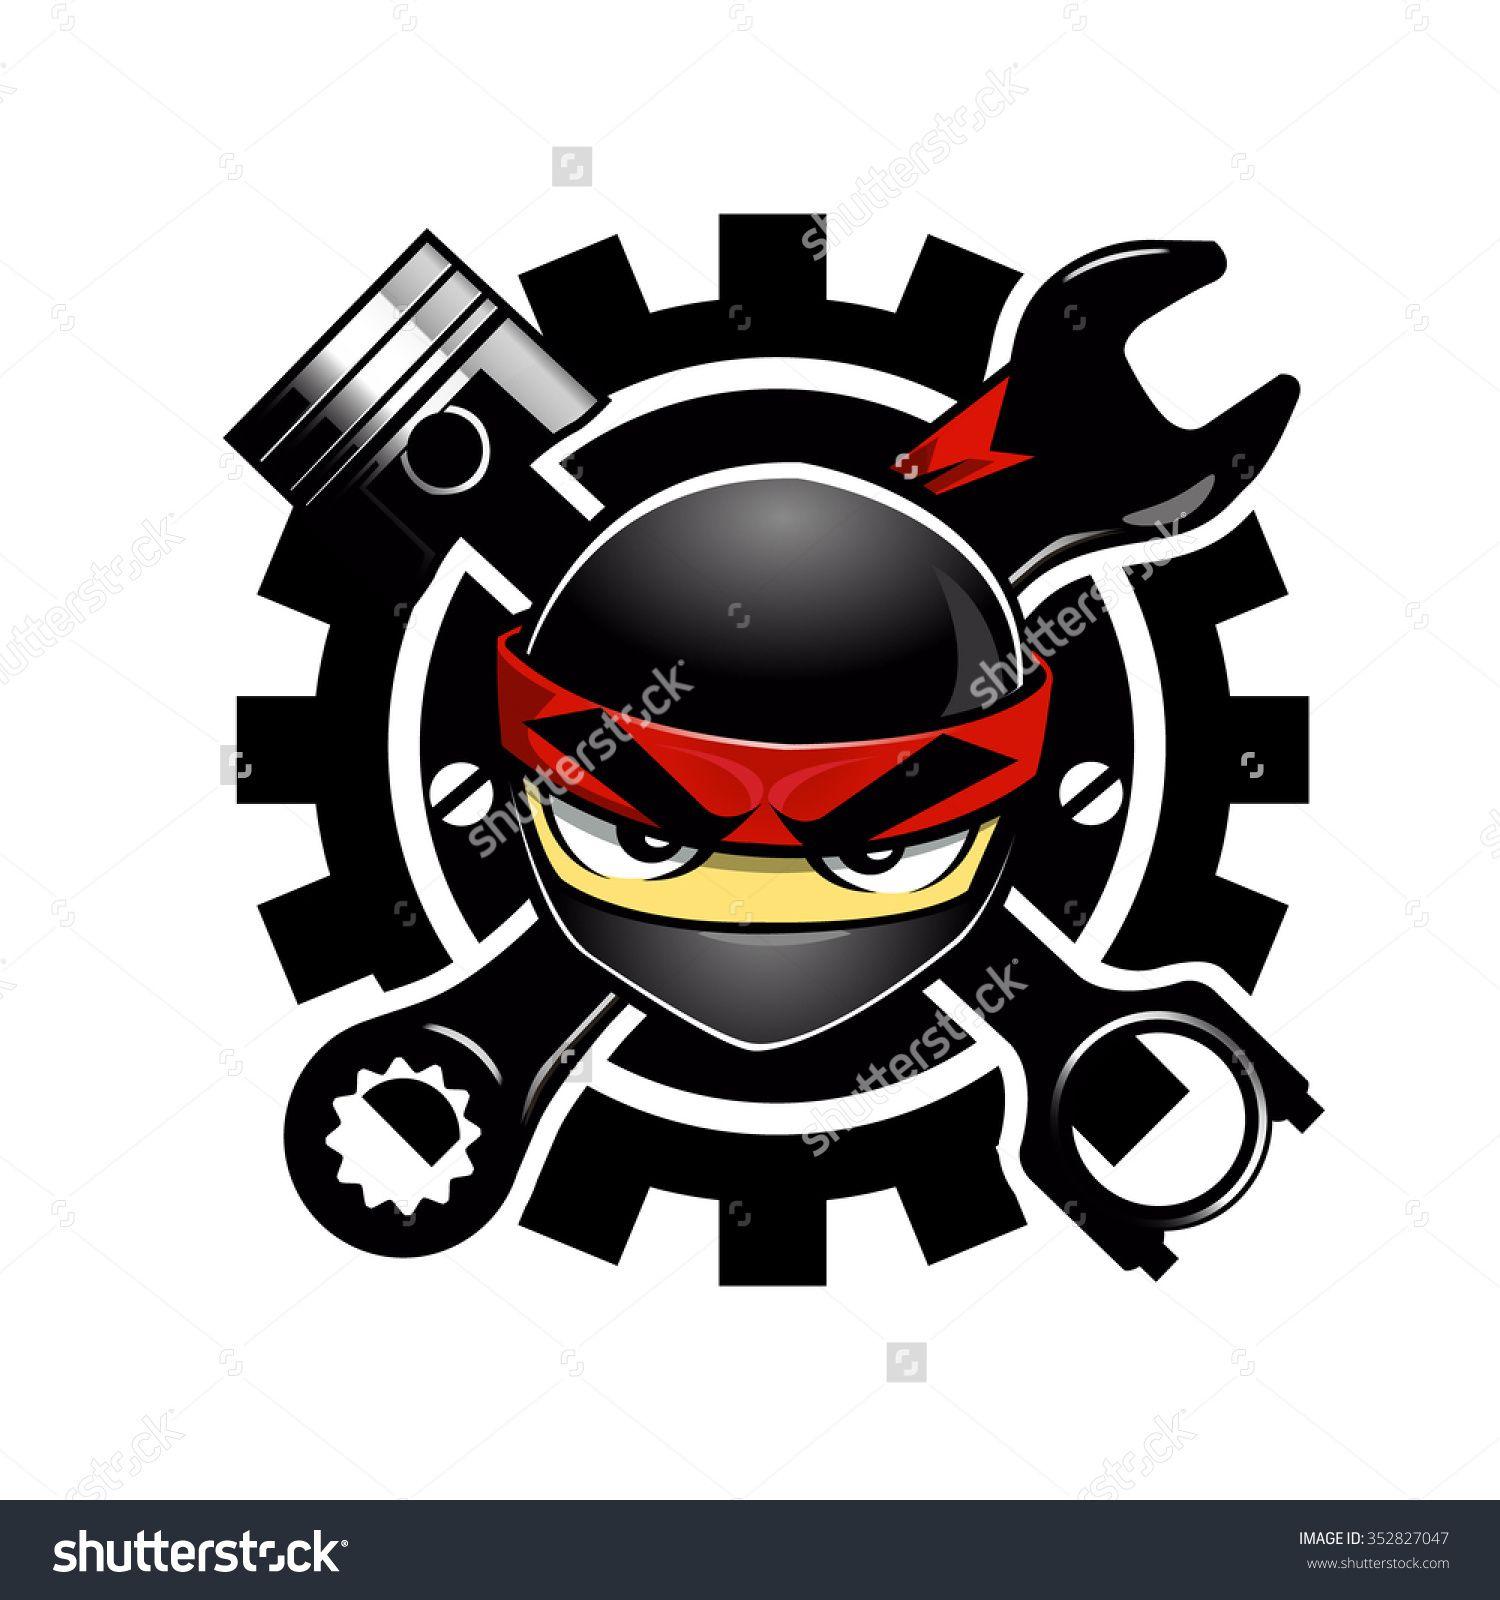 Ninja Auto parts logo Preview. Save to a lightbox Ninja